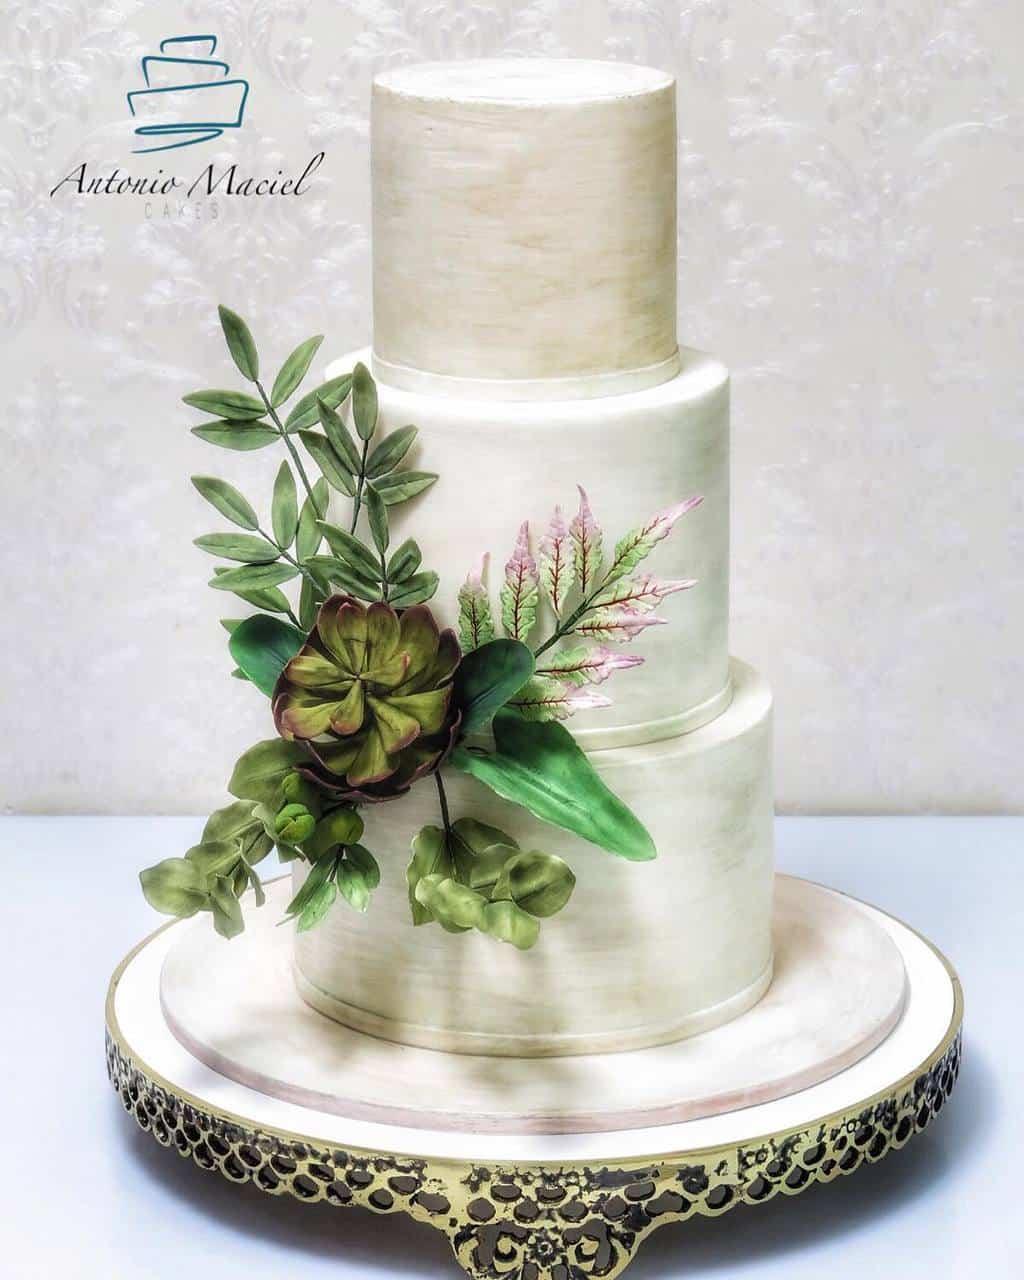 Antonio-Maciel-Tower-Cake